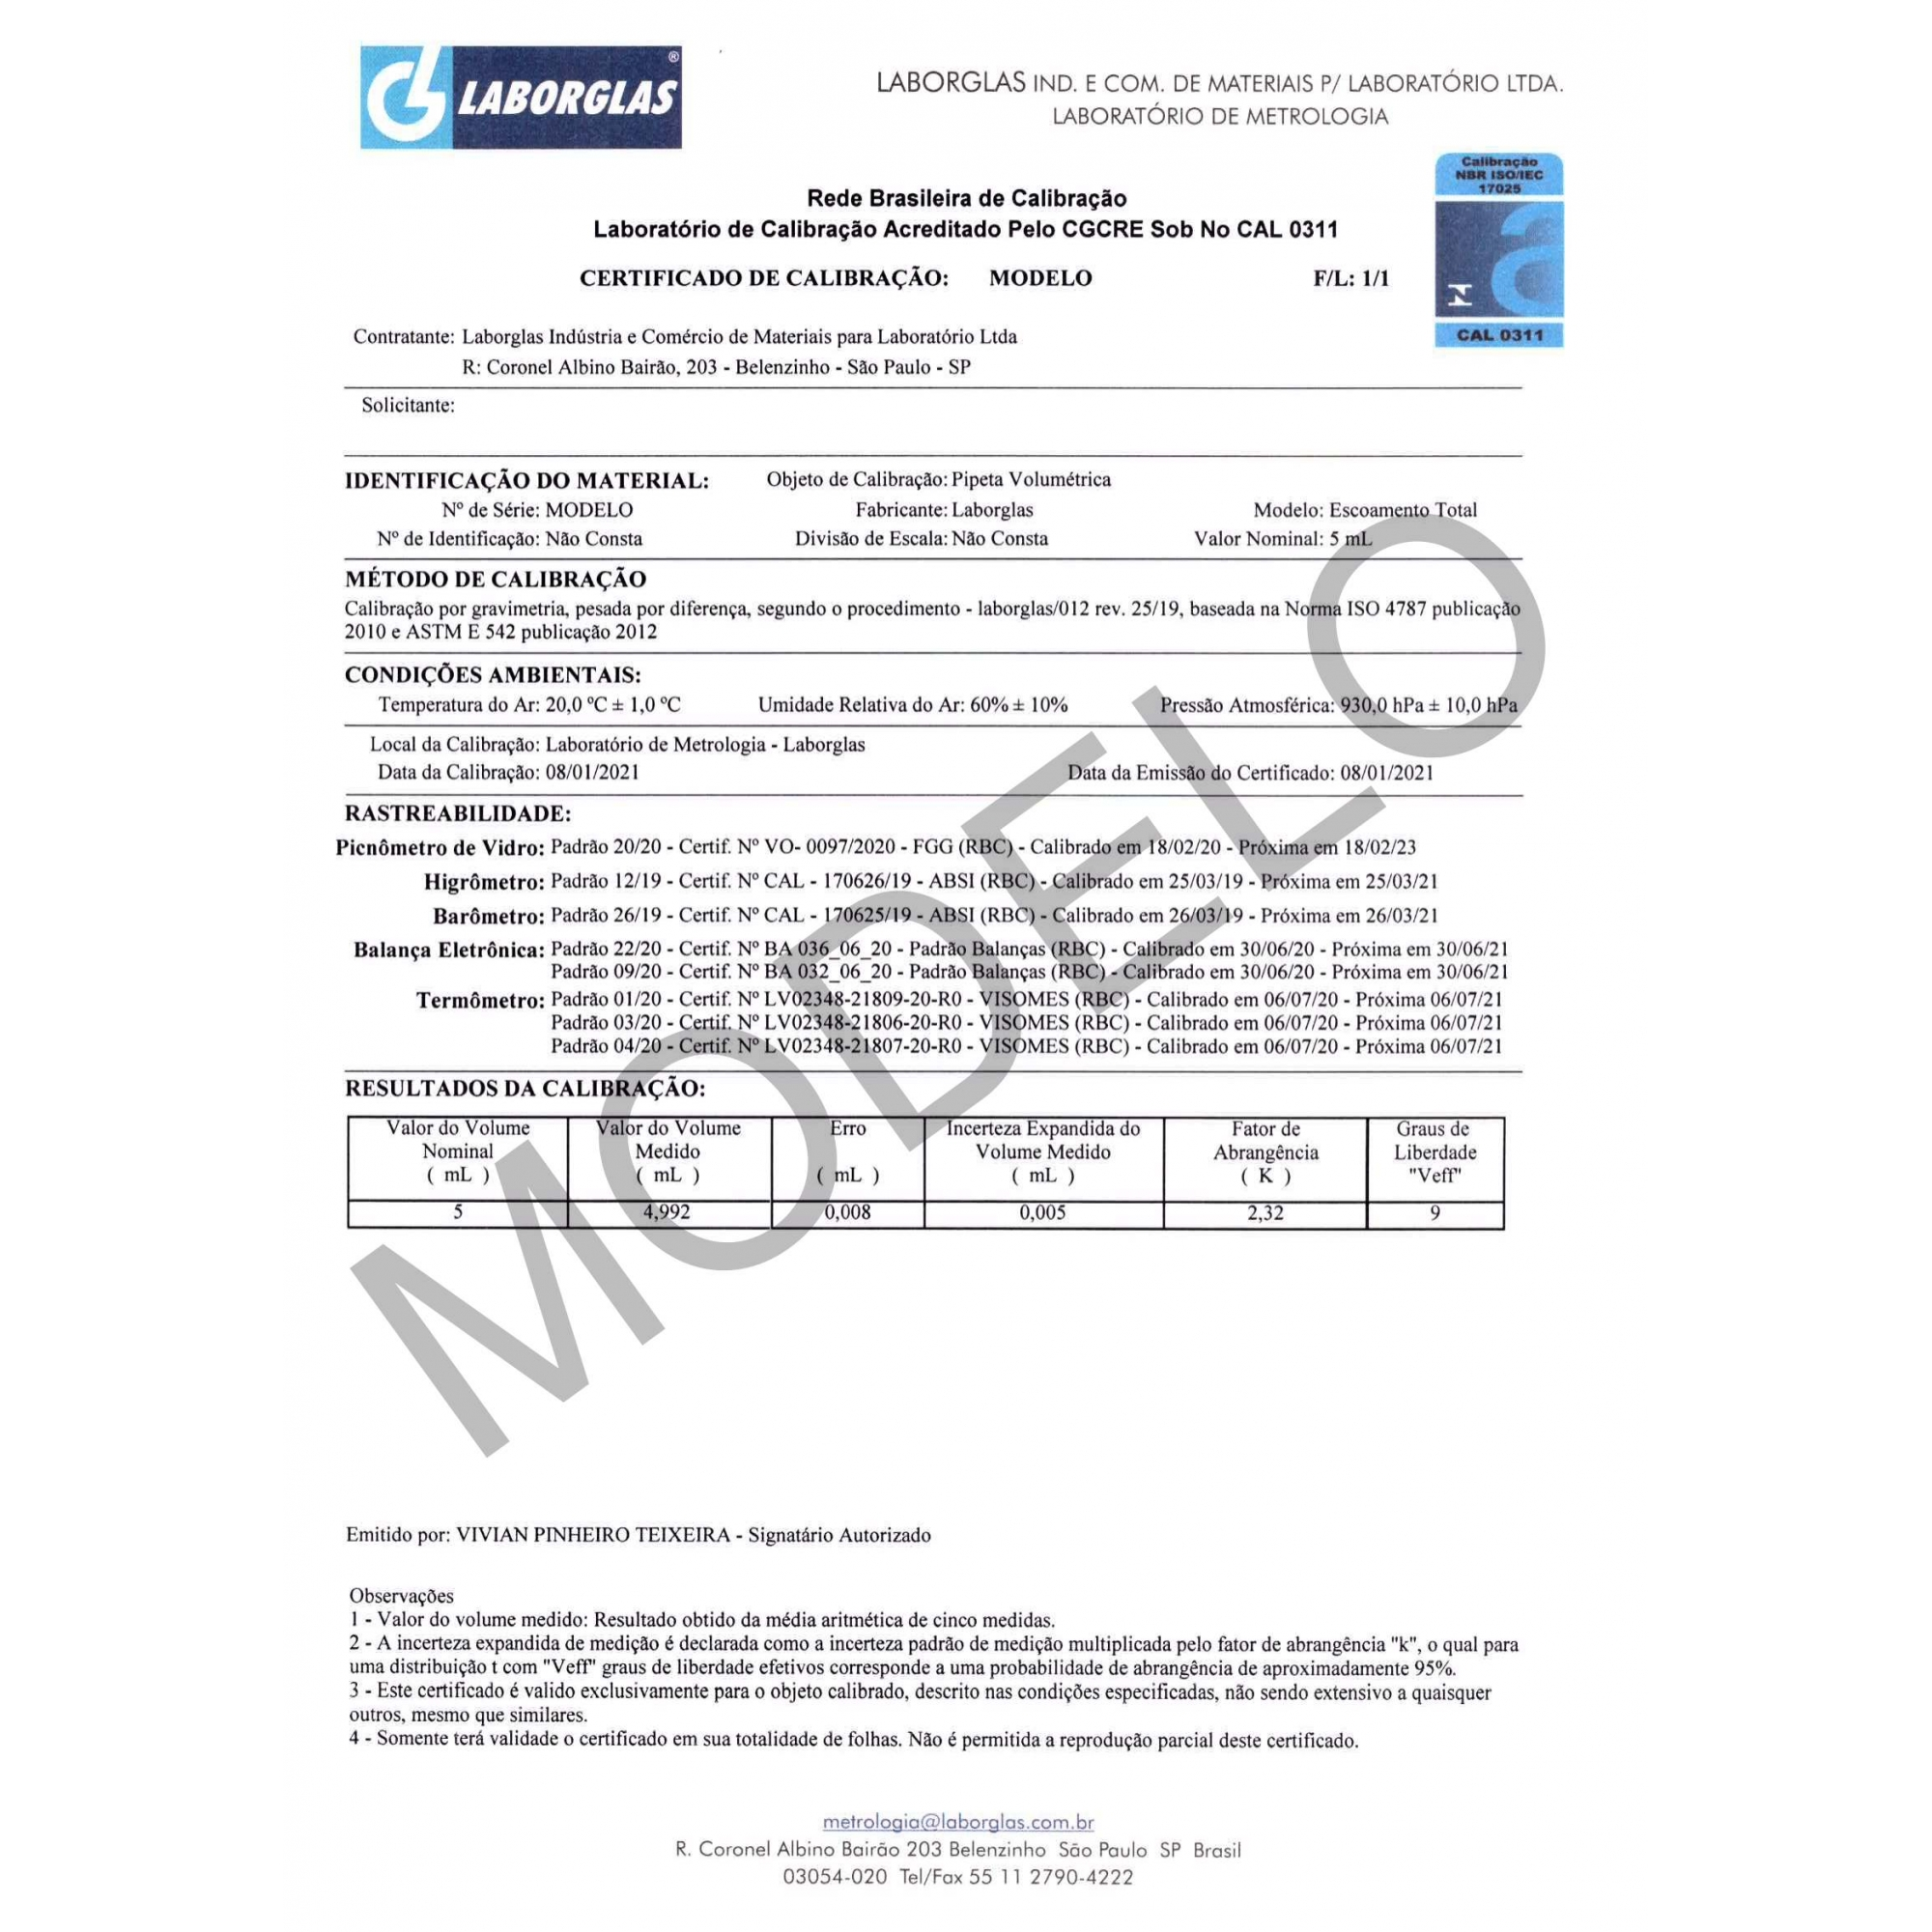 PIPETA VOLUMÉTRICA ESGOTAMENTO TOTAL 1,5 ML CERTIFICADO RBC - Laborglas - Cód. 9433719-R